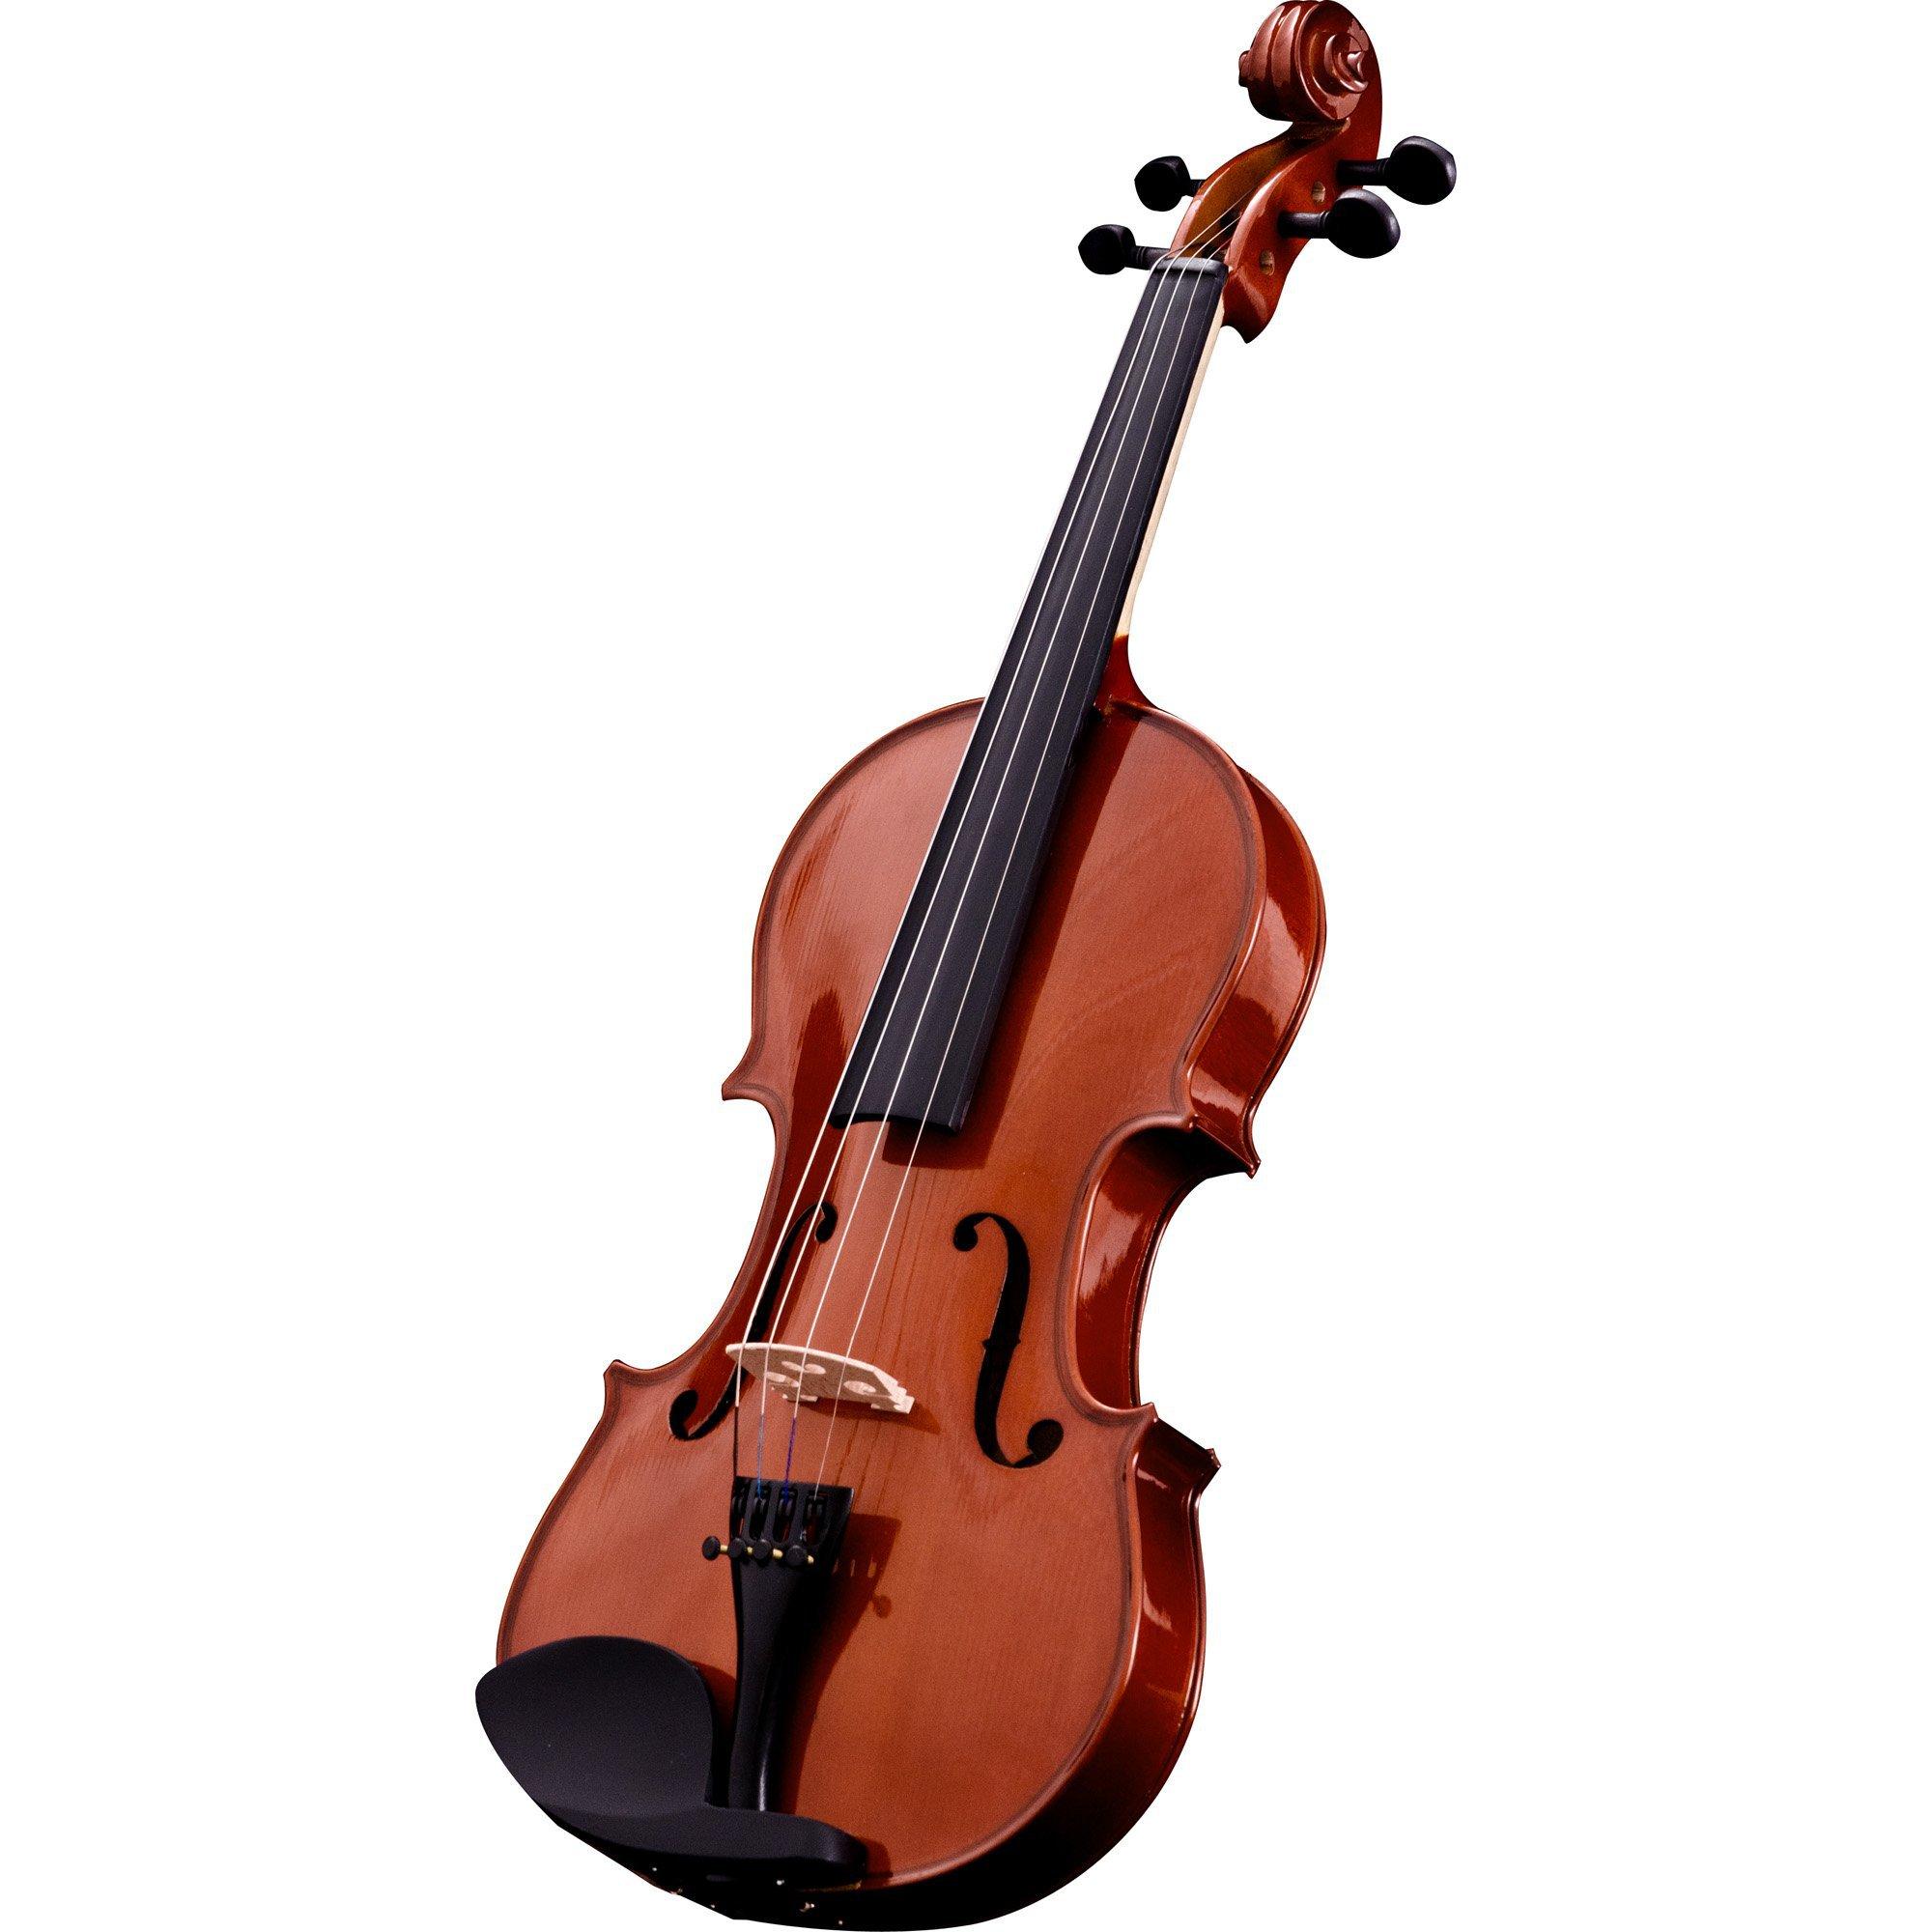 violino 4 4 va 10 oportunidade natural harmonics 42888 2000 181307